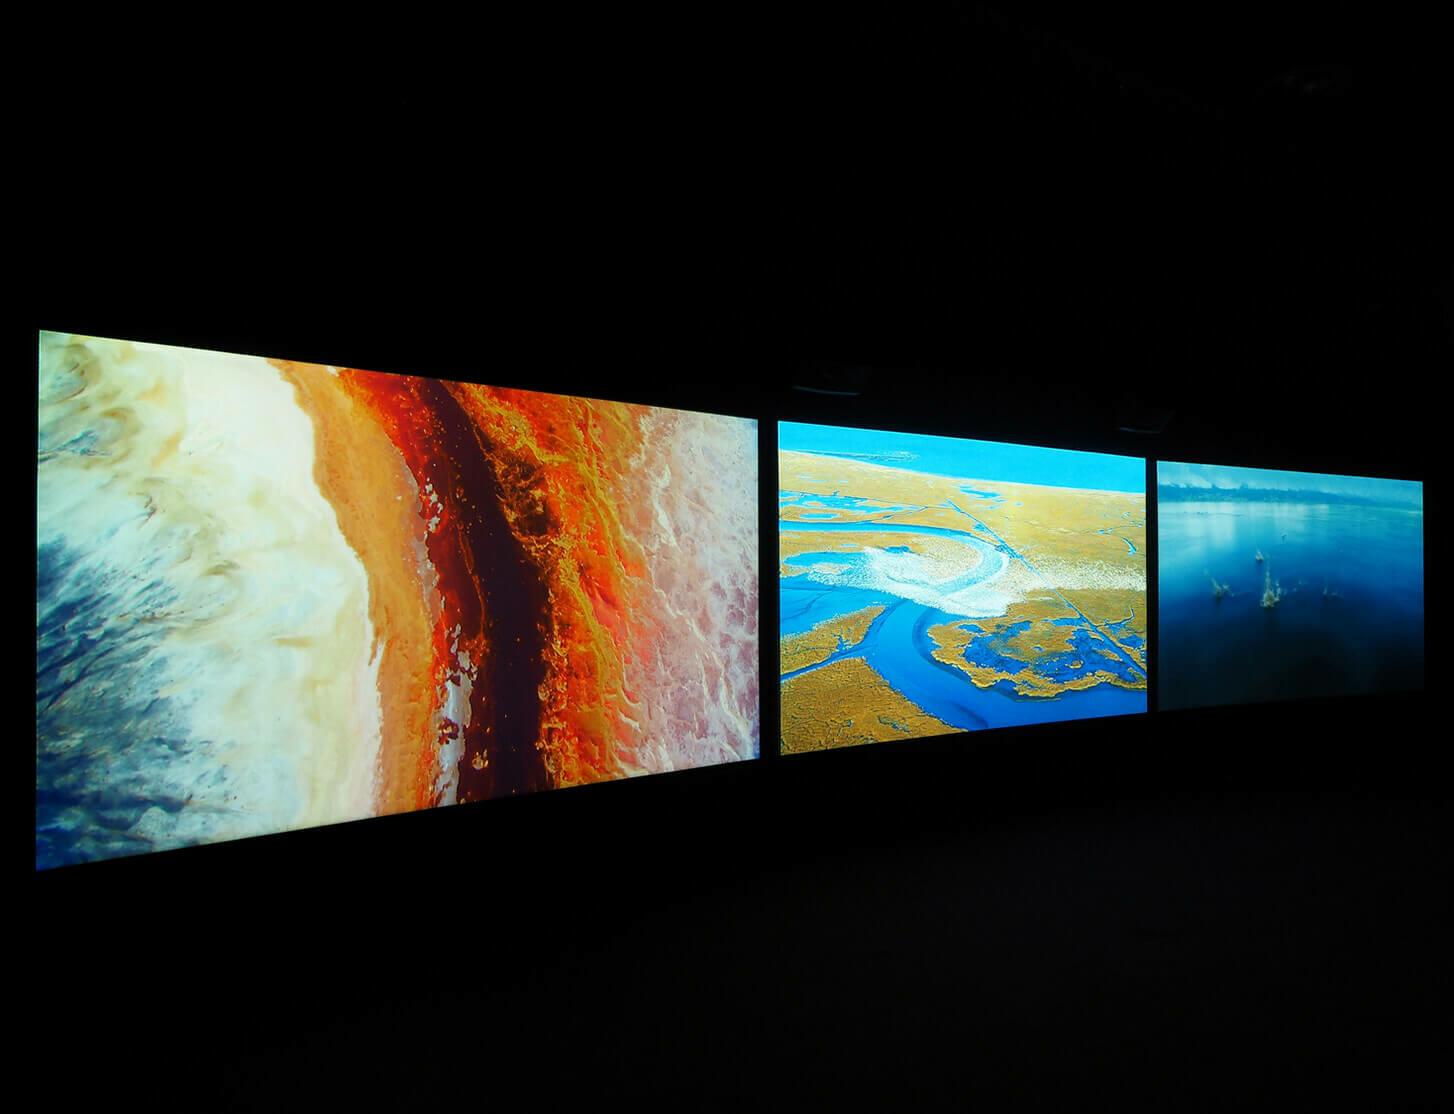 John Akomfrah's Vertigo Sea on view at Towner Gallery